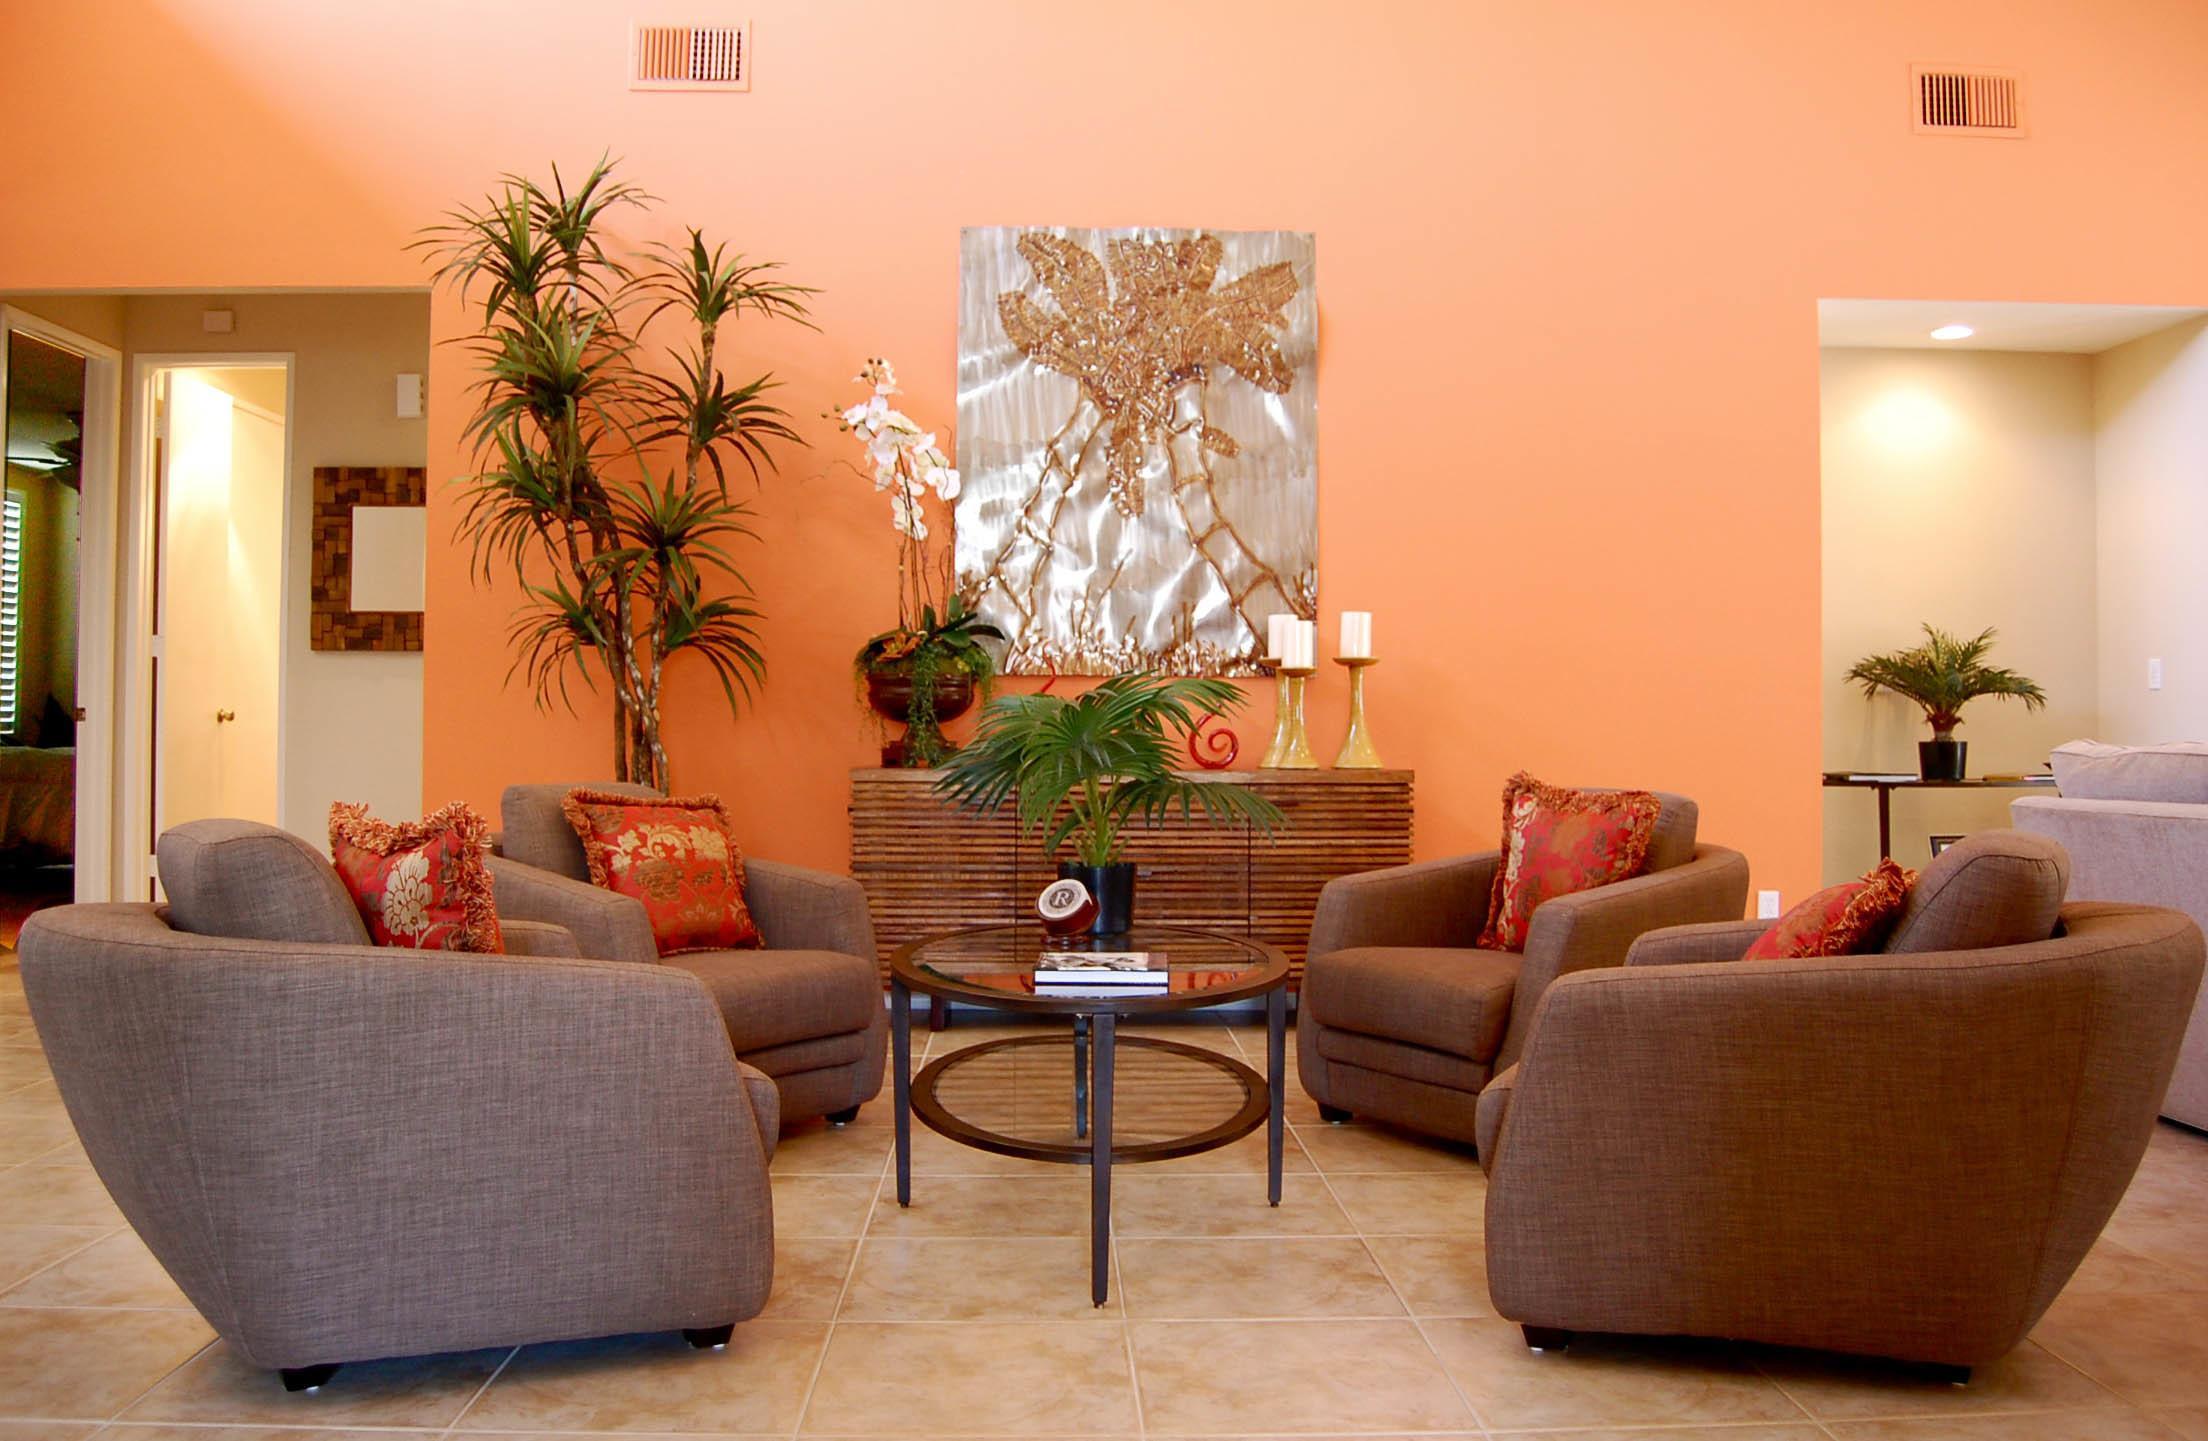 Wonderful Orange Room Design Ideas You Have Ever Seen Photo Gallery Decoratorist